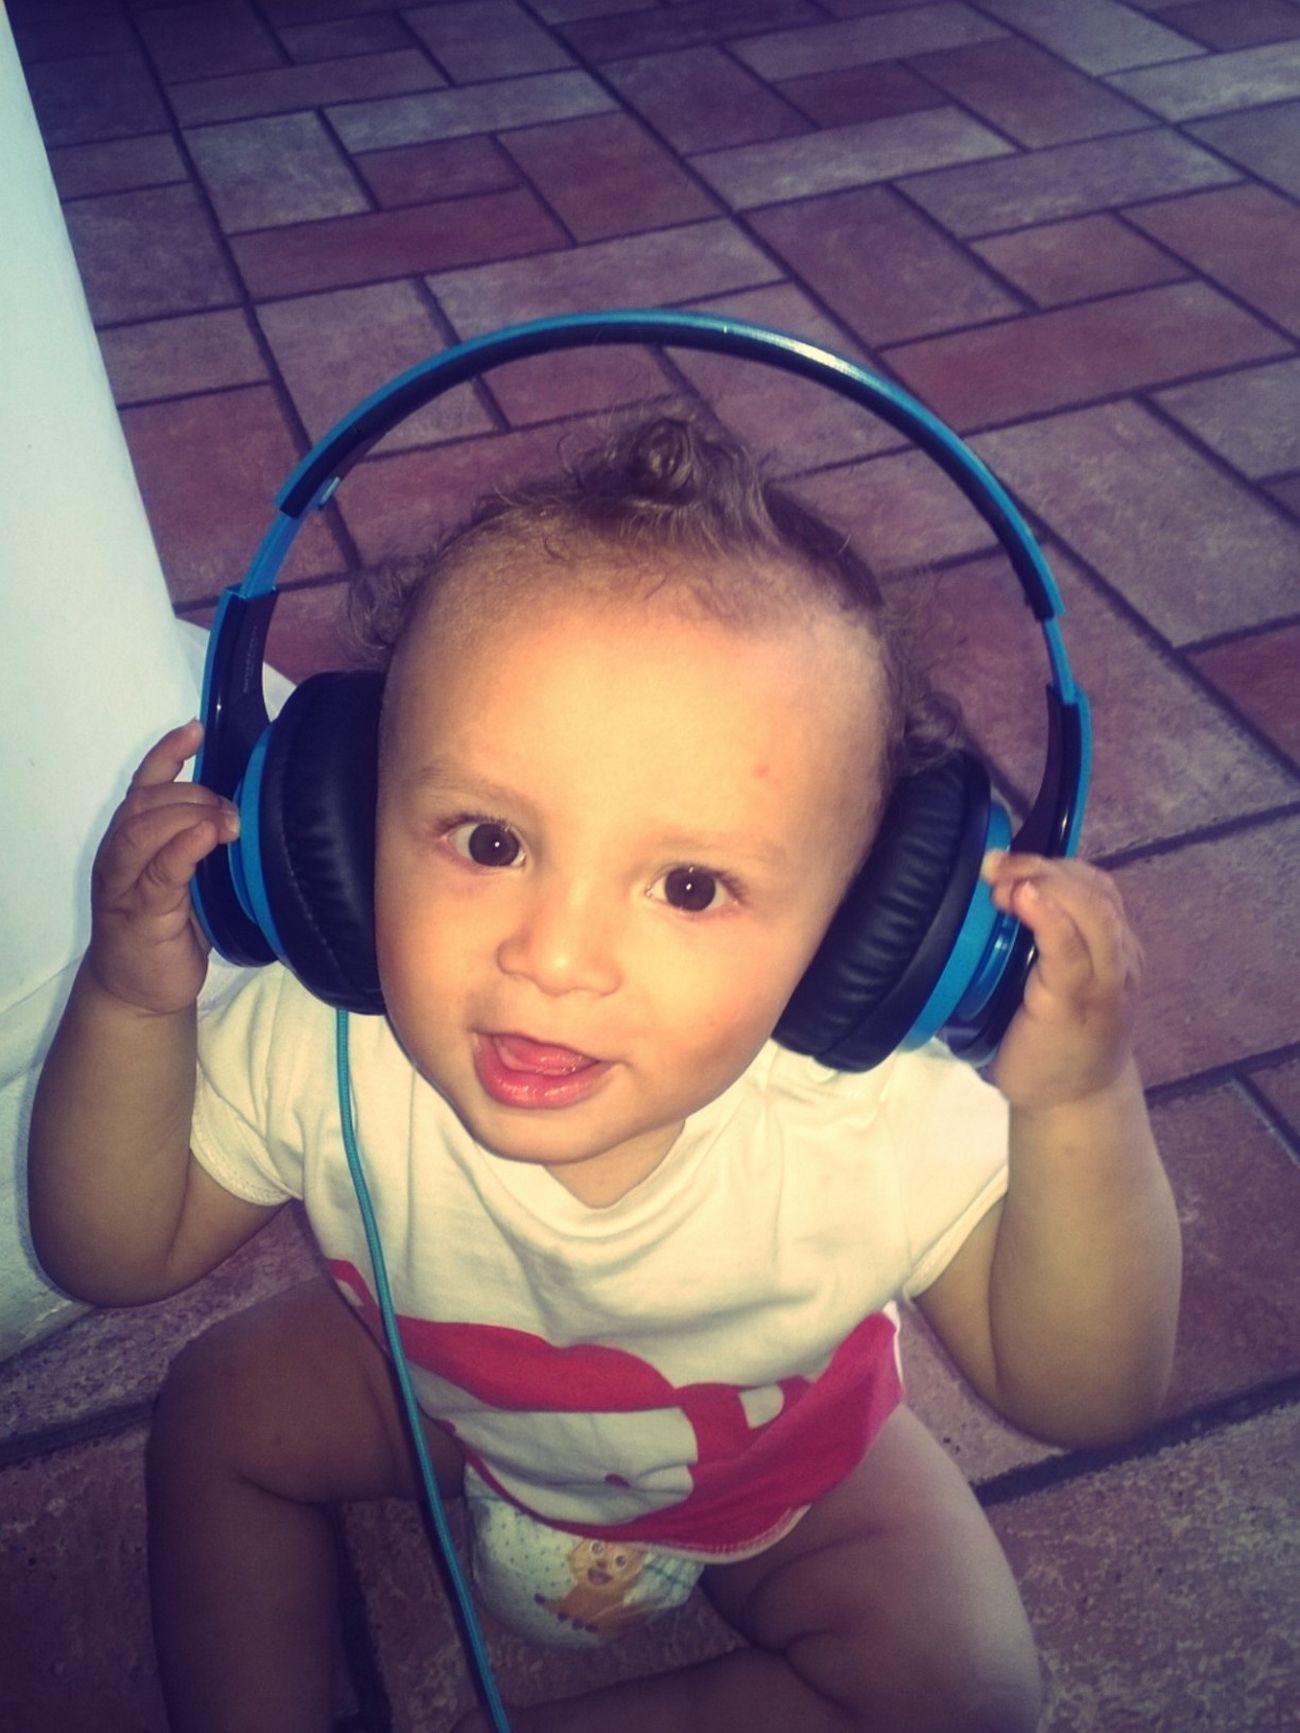 Baby Babyhood Childhood Cute Dance Enjoyment Fun Good Song ♪♬ Home Sweet Home Innocence Listening To Music Lovehim Misshim Mybabyboy❤️❤️❤️❤️ Nephew ♡ Timetogether Timetorelax Toobig